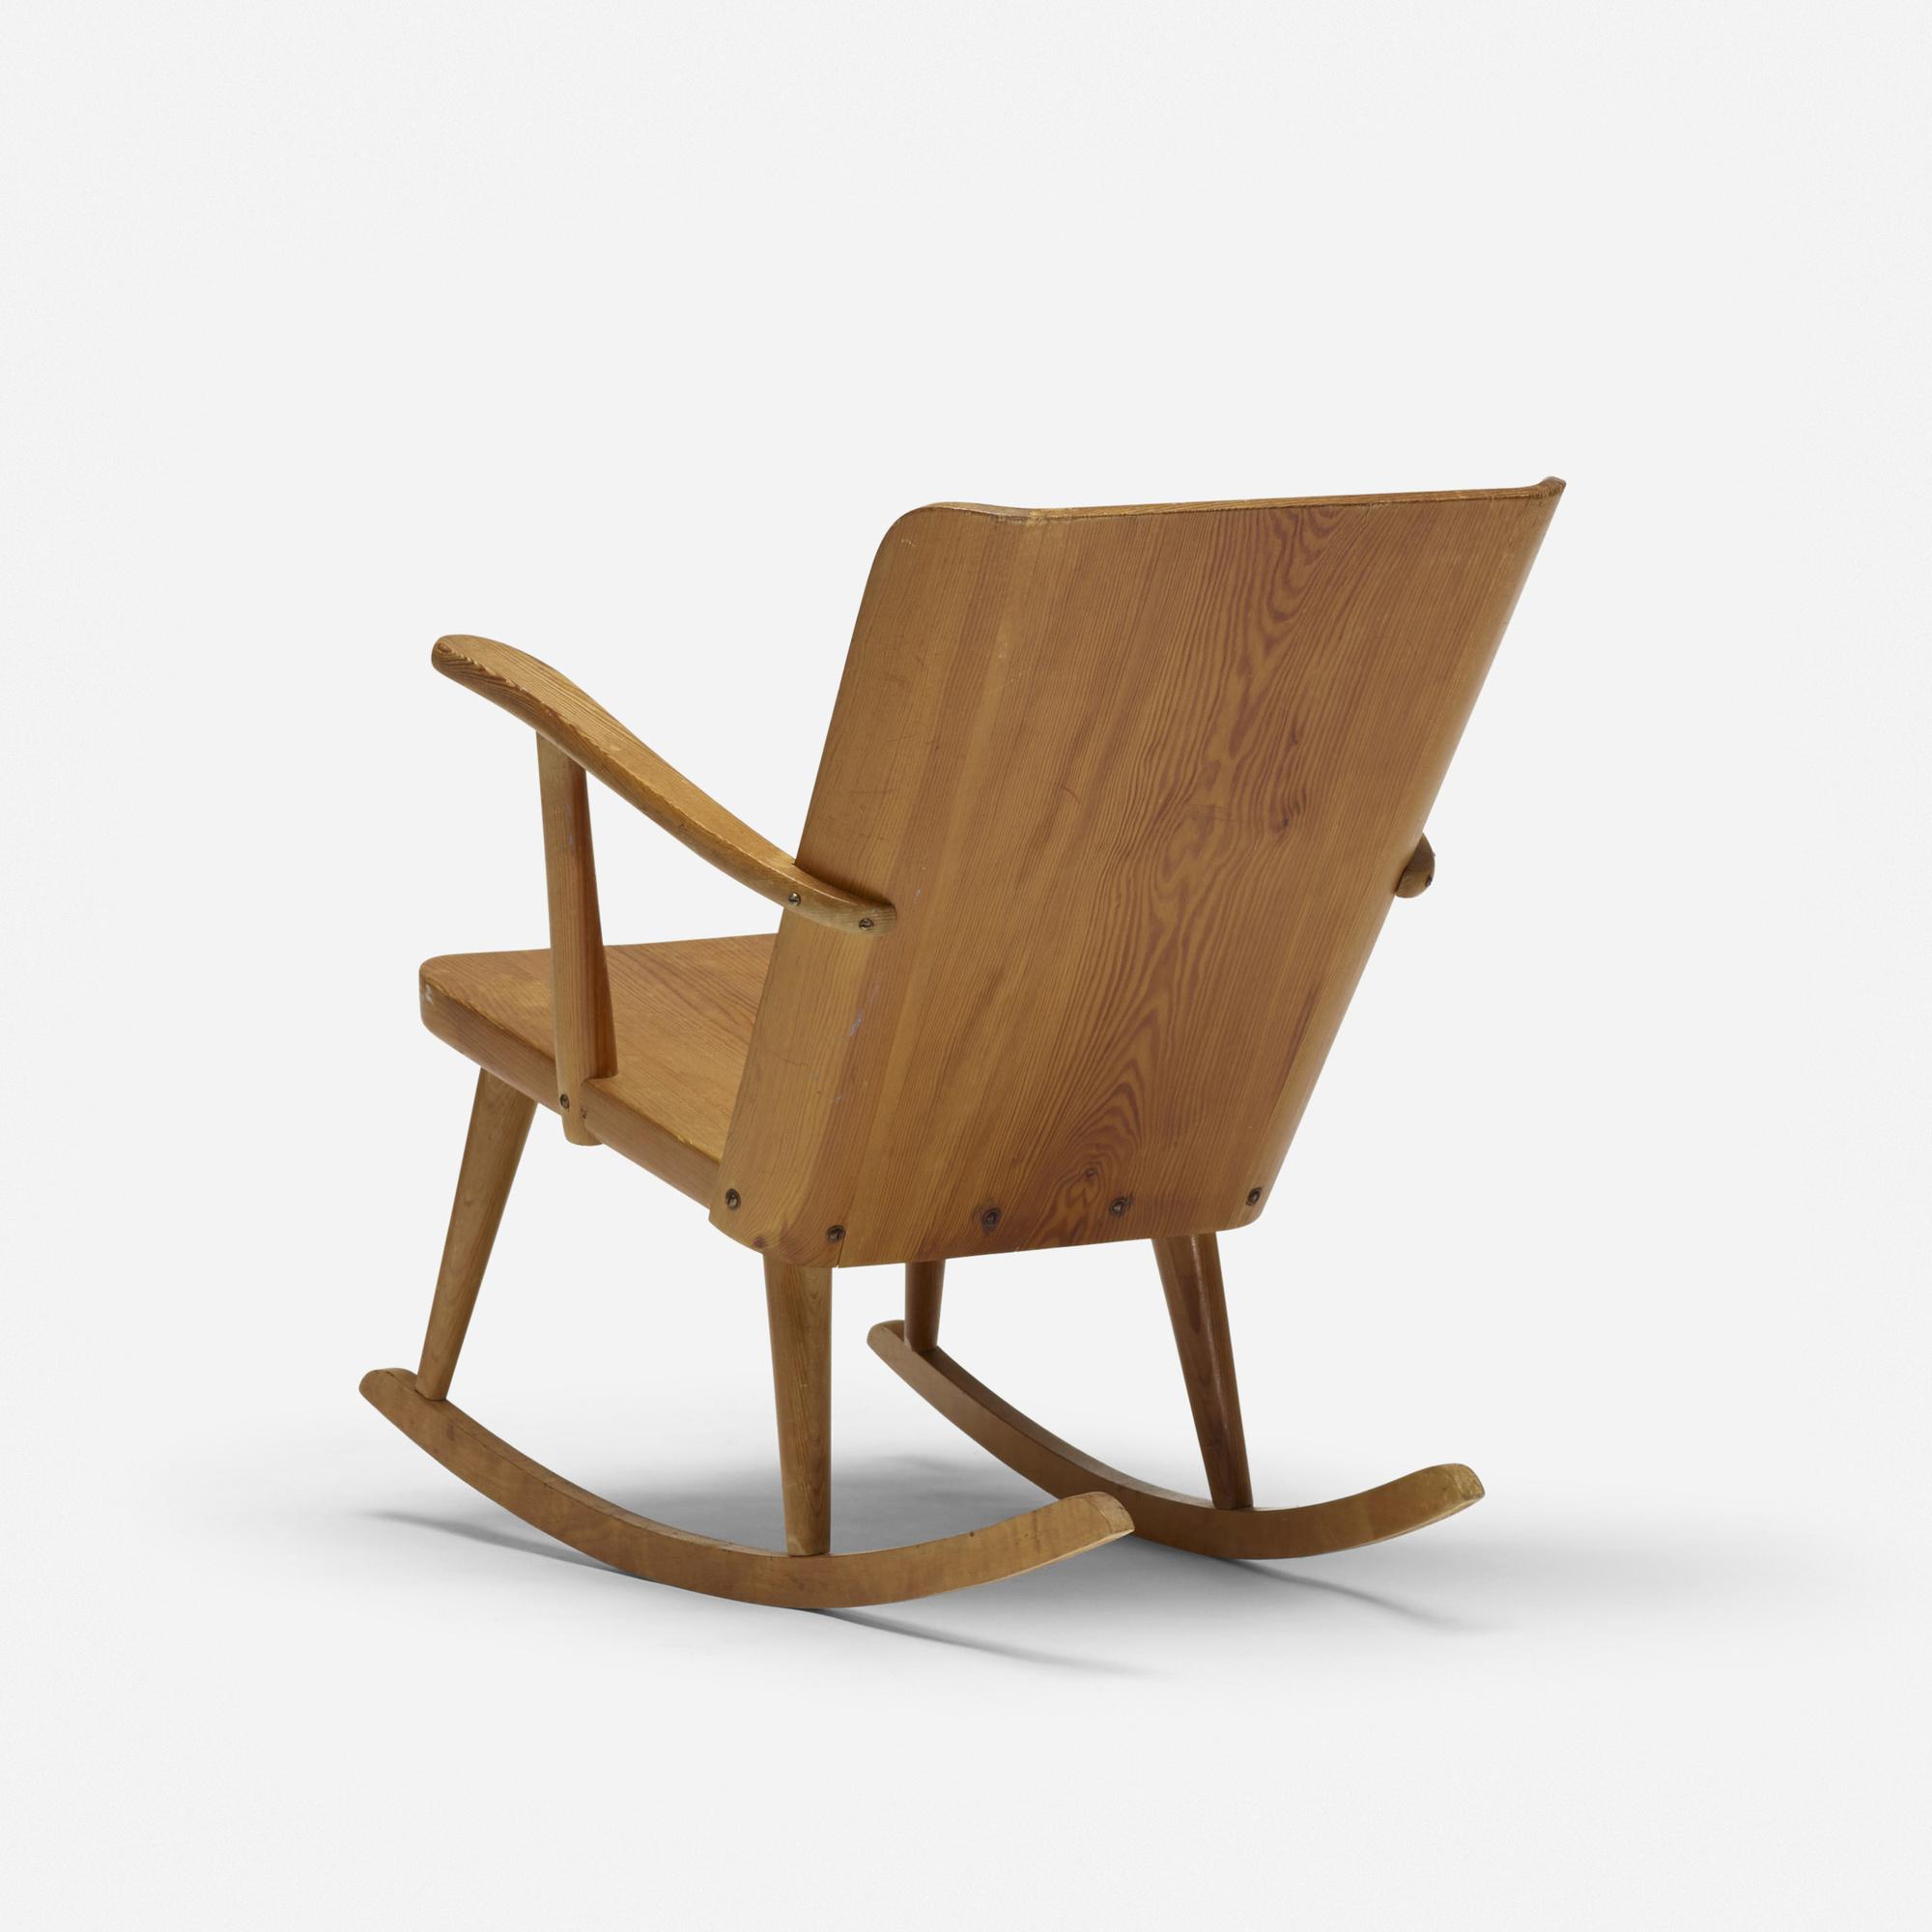 241: Carl Malmsten / pine rocking chair (1 of 3)